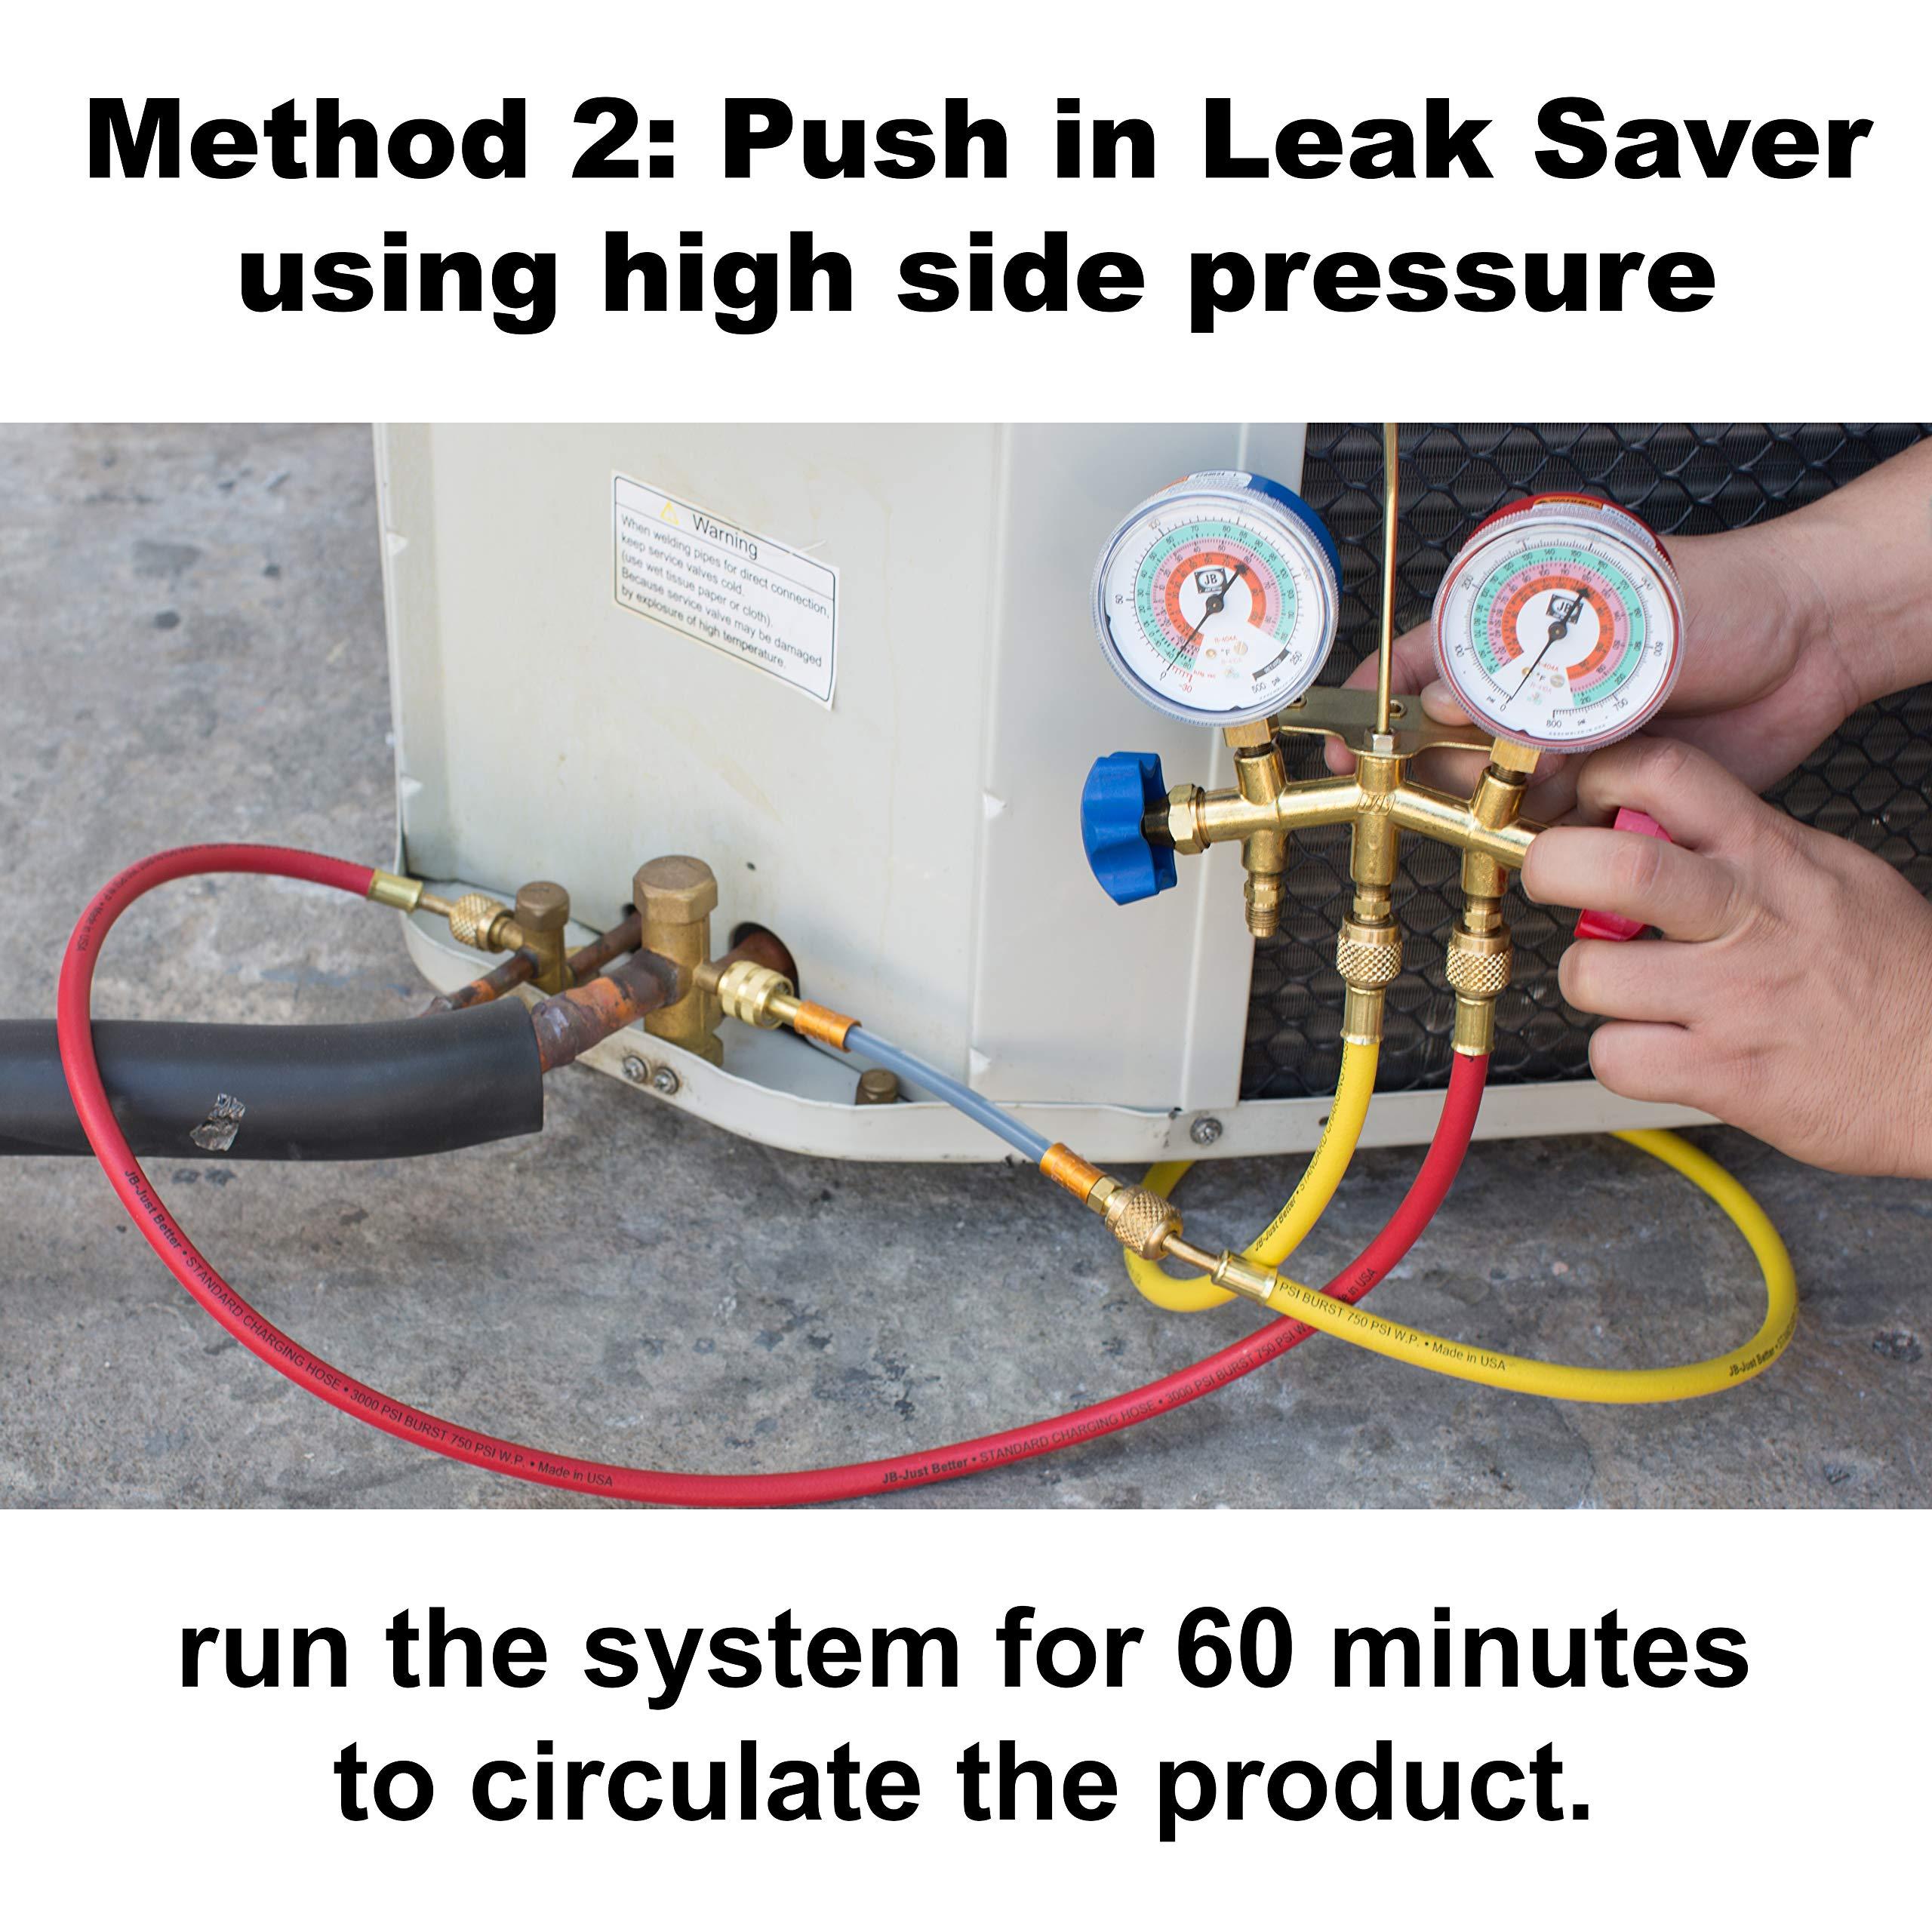 Leak Savers Direct Inject Refrigerant Leak Sealer with UV Dye (3 Pack) by Leak Savers (Image #5)